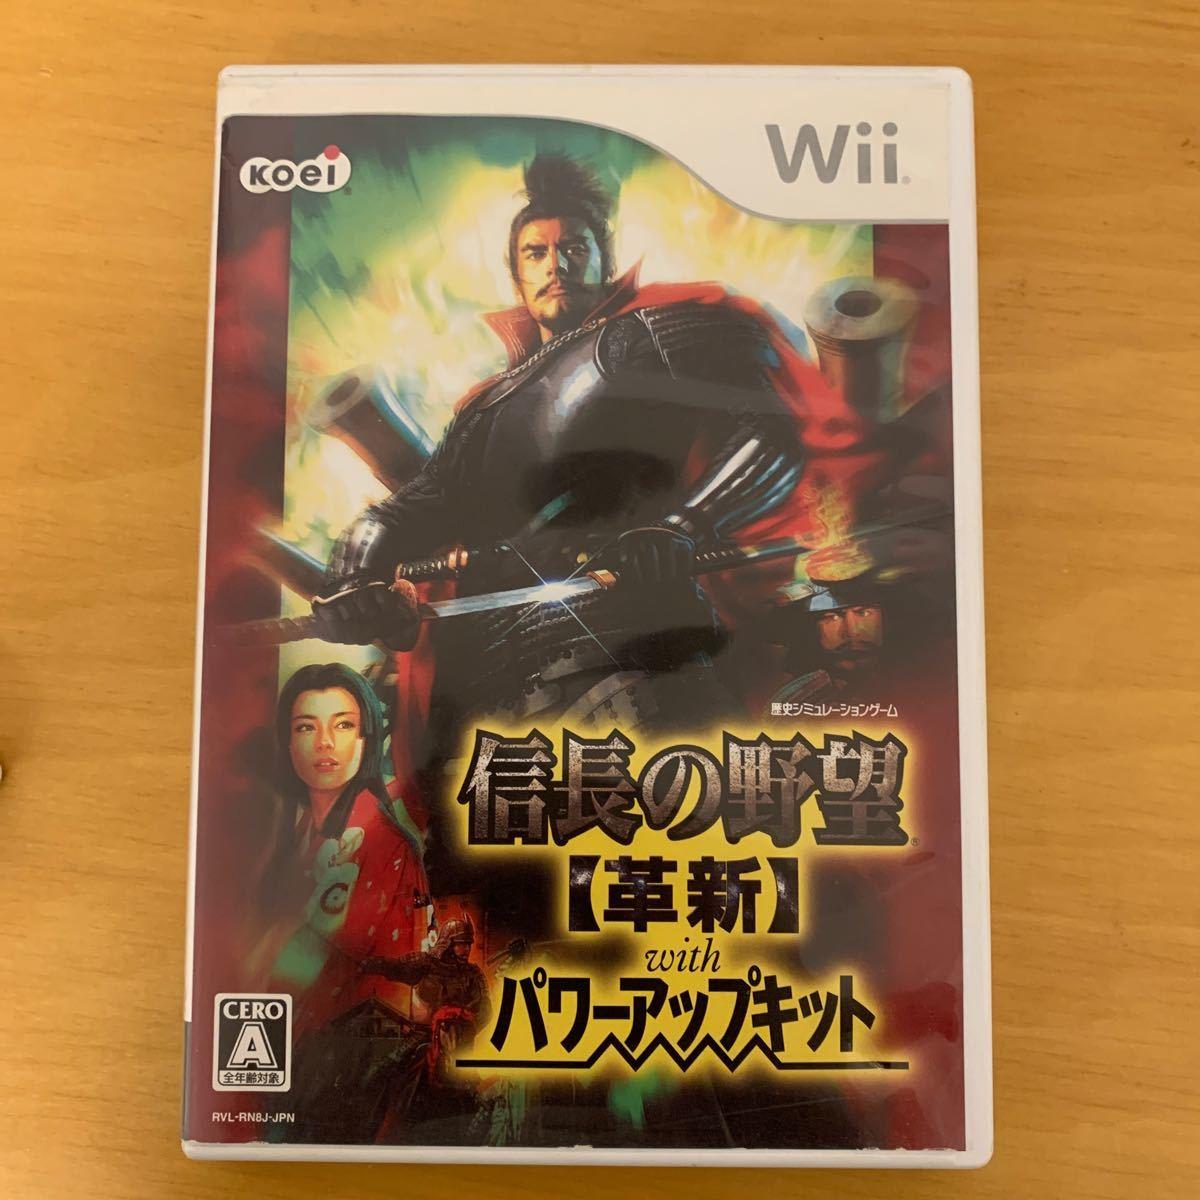 【Wii】 (おまけ付き)信長の野望・革新 with パワーアップキット